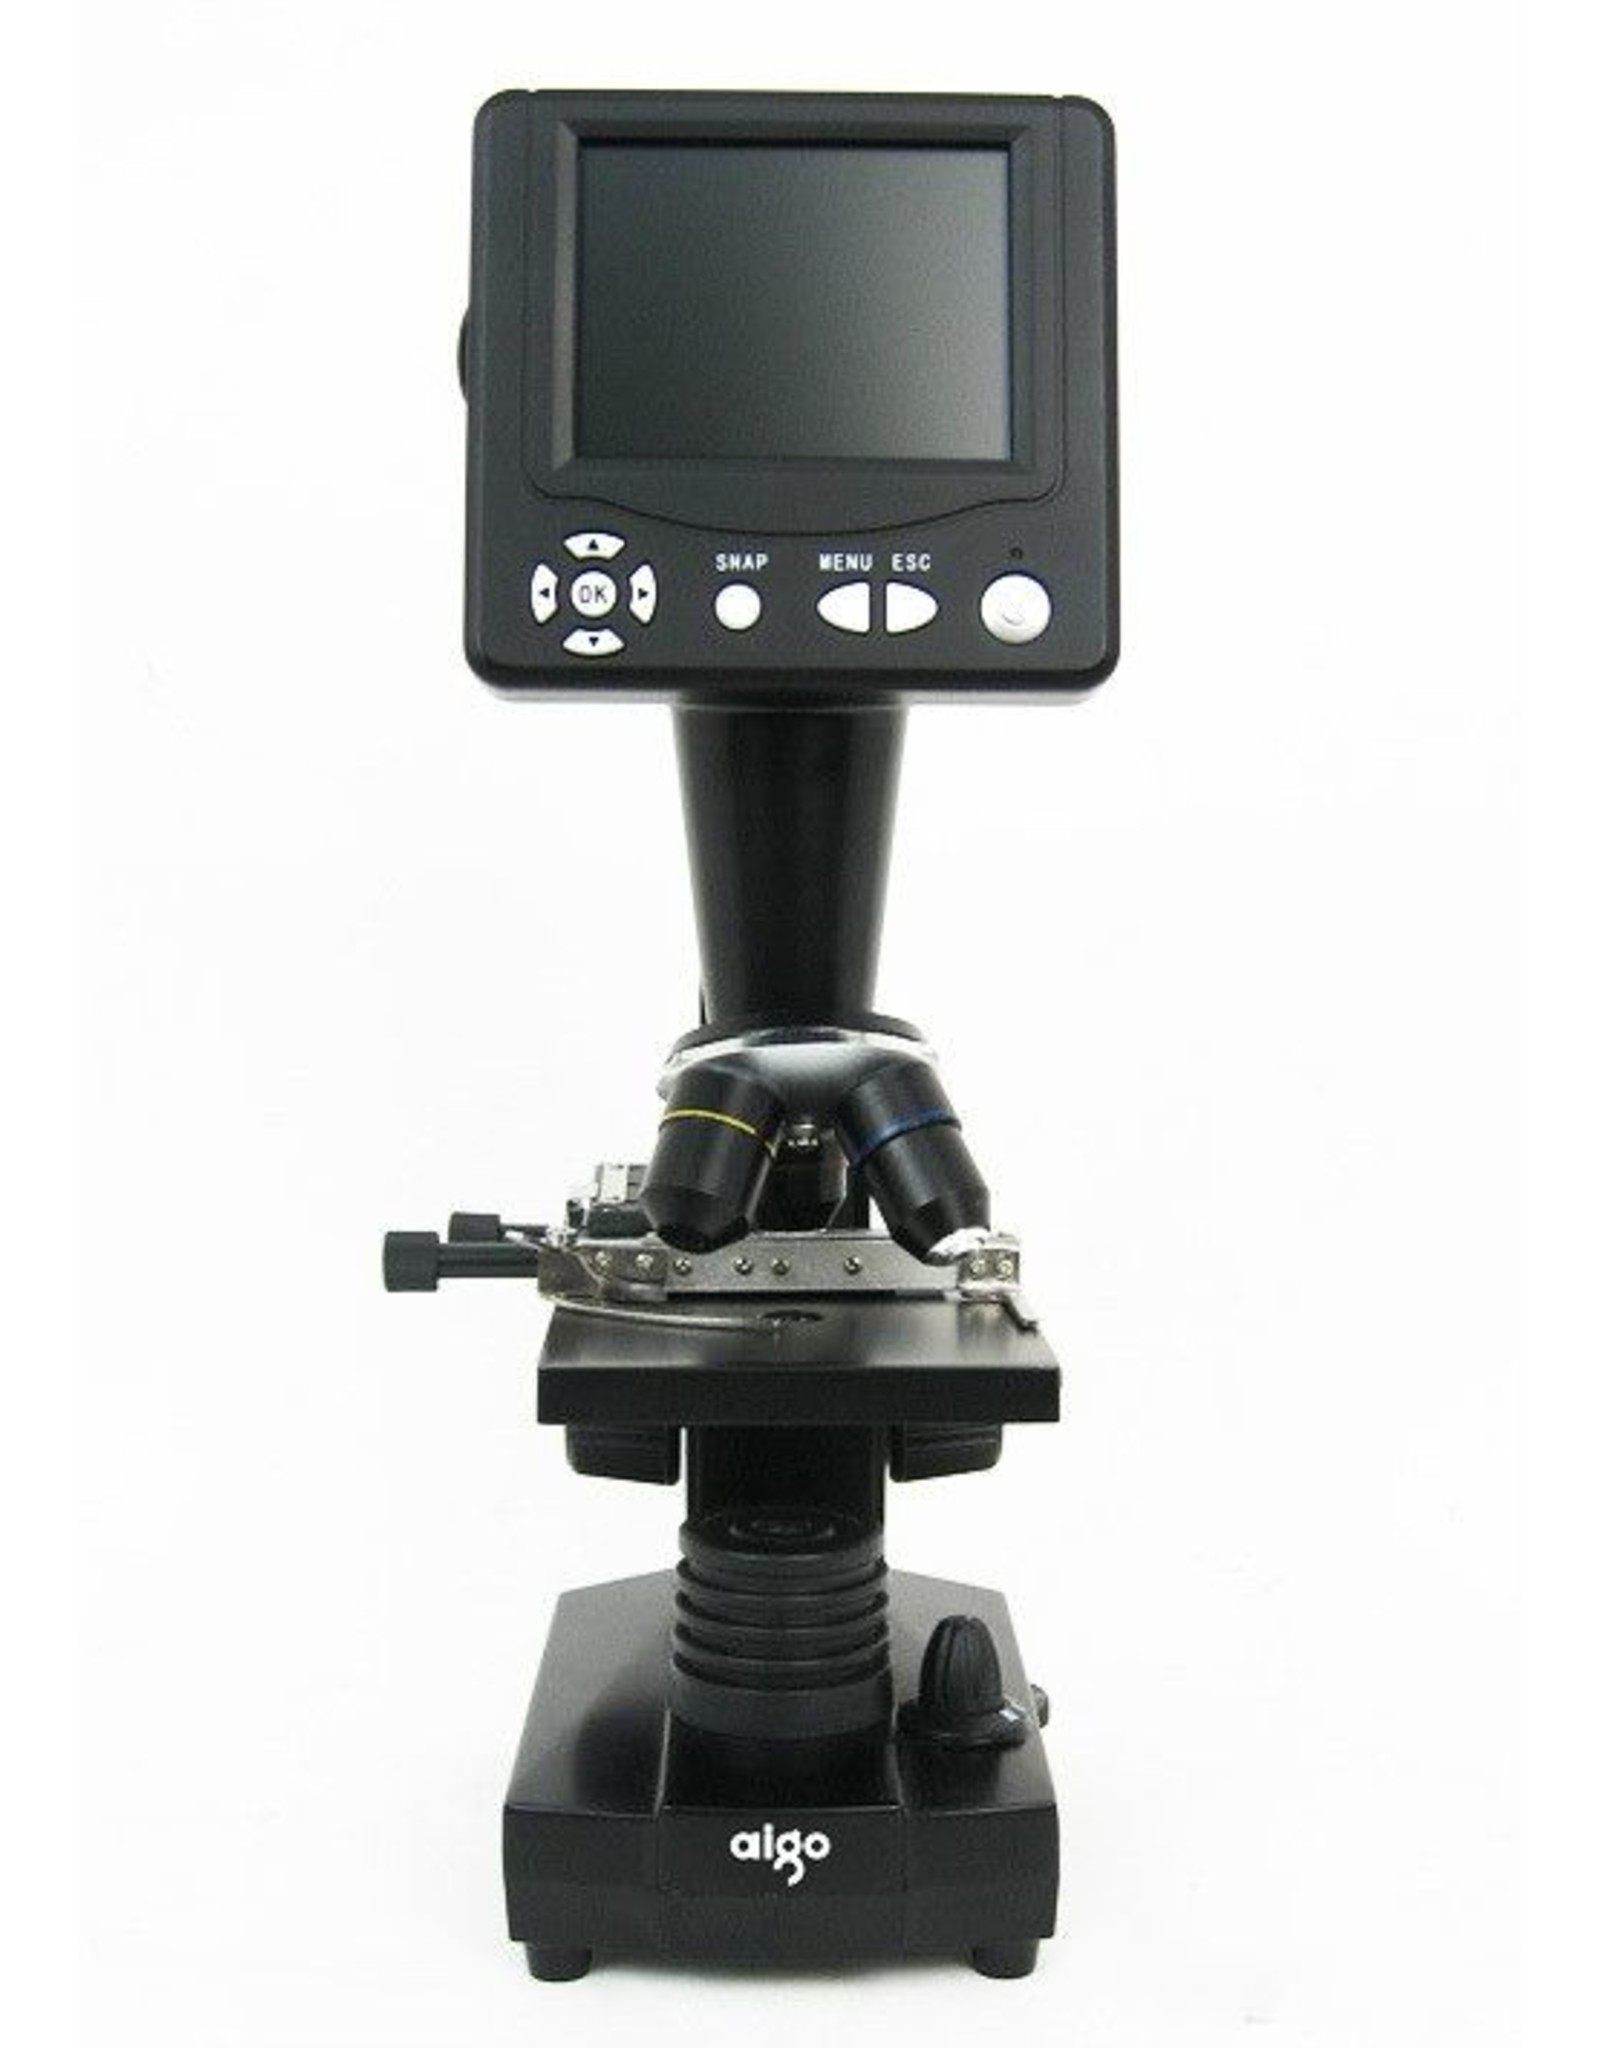 Bresser Bresser LCD Microscope 3.5 Inch Display 50x-500x (2000x Digital) 5MP